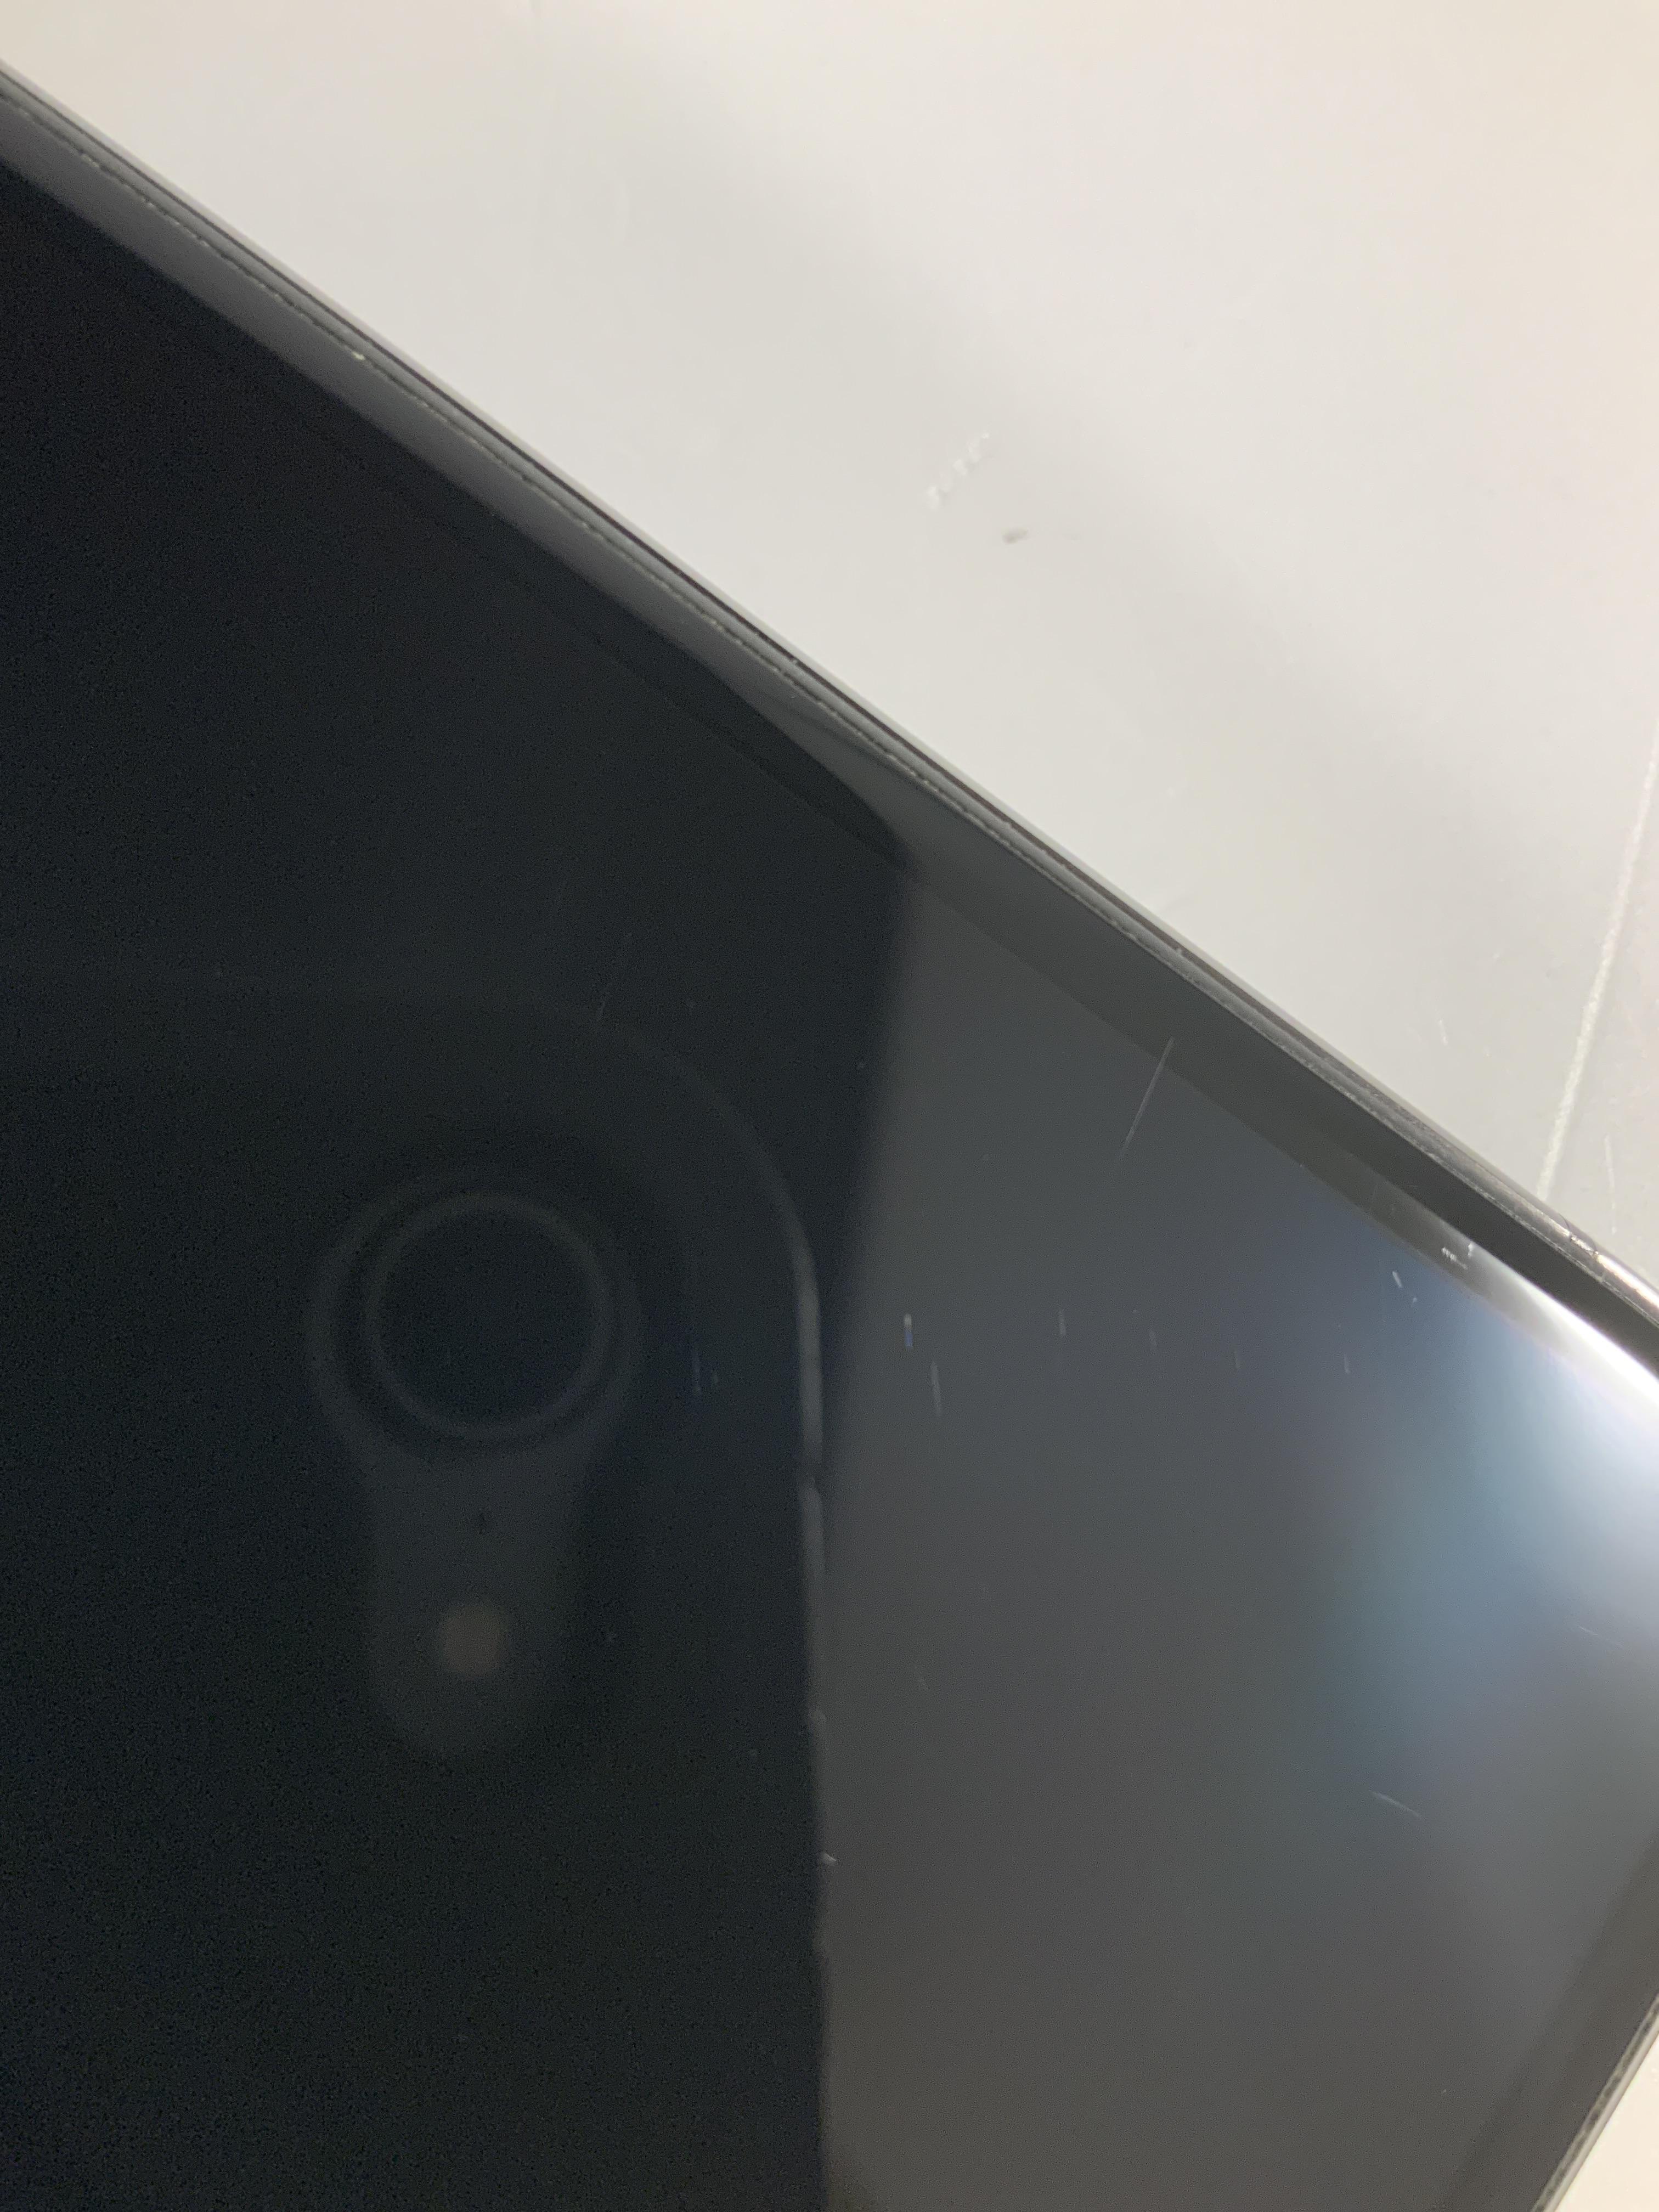 iPhone XS Max 256GB, 256GB, Space Gray, bild 4